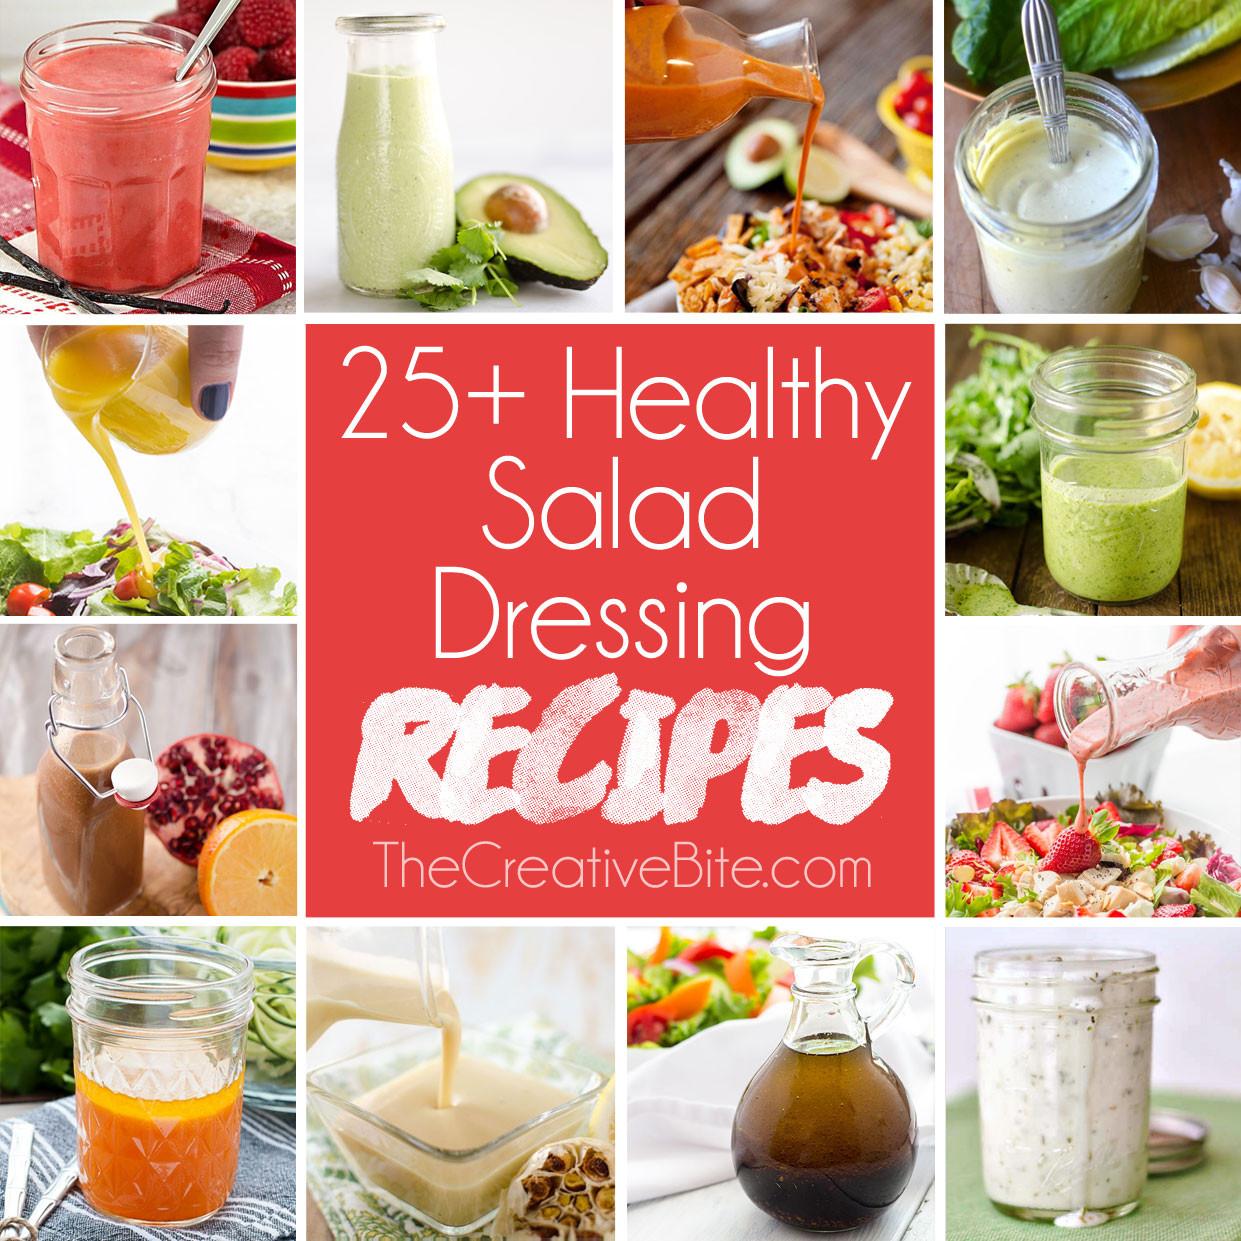 Recipes For Healthy Salad Dressings  Healthy Salad Dressing Recipes